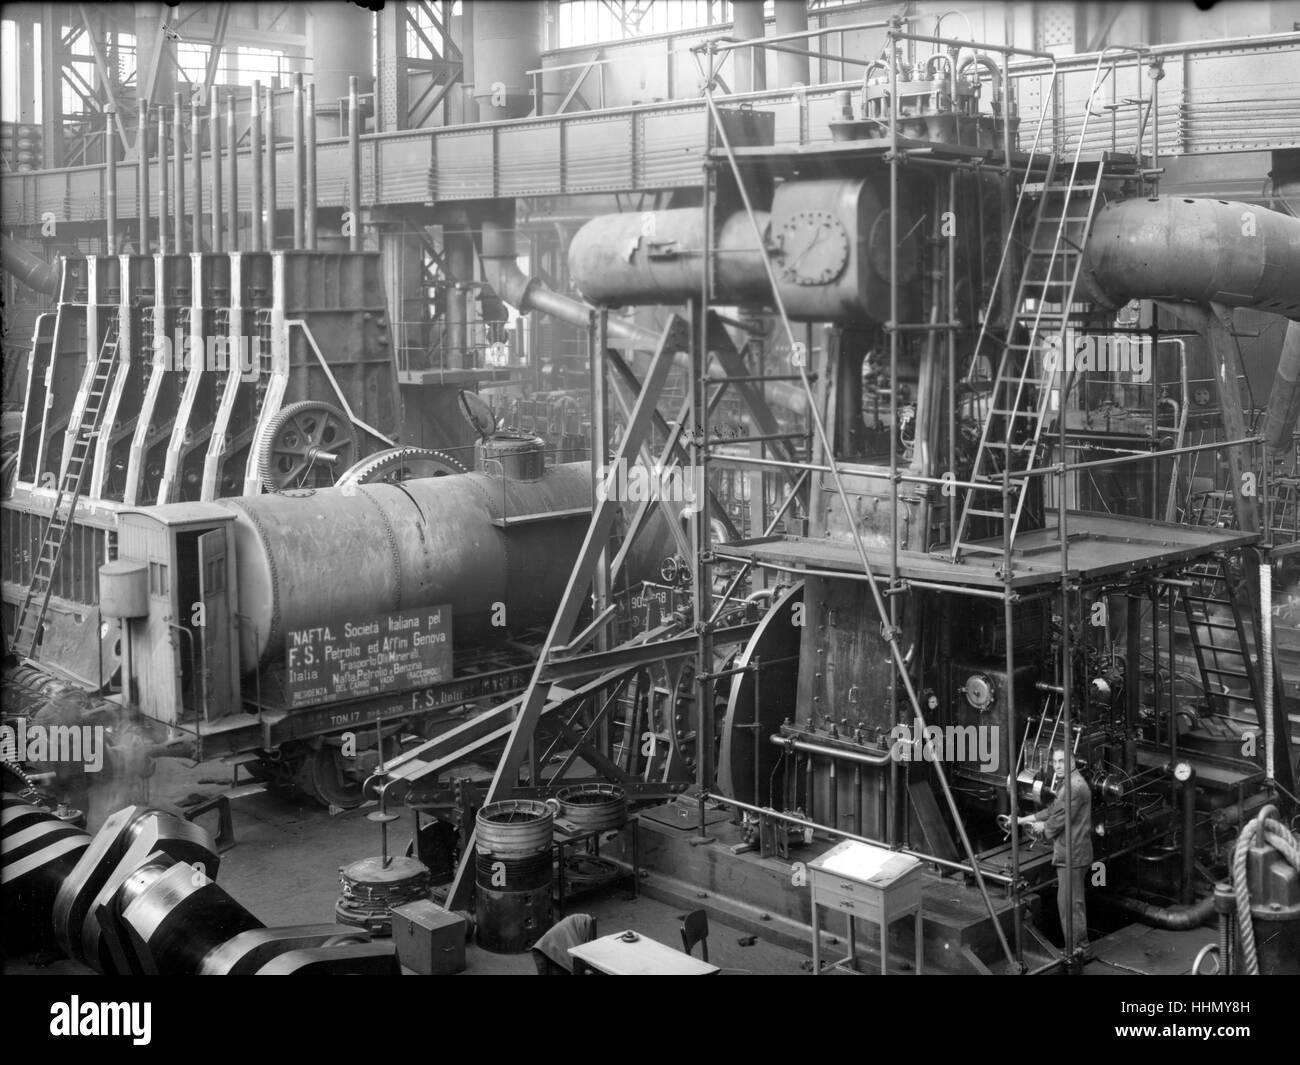 1930 - 40. Fiat - Ansaldo grandes motores en fábrica genua, San Pier d'Arena, sanpierdarena, Italia. Foto de stock